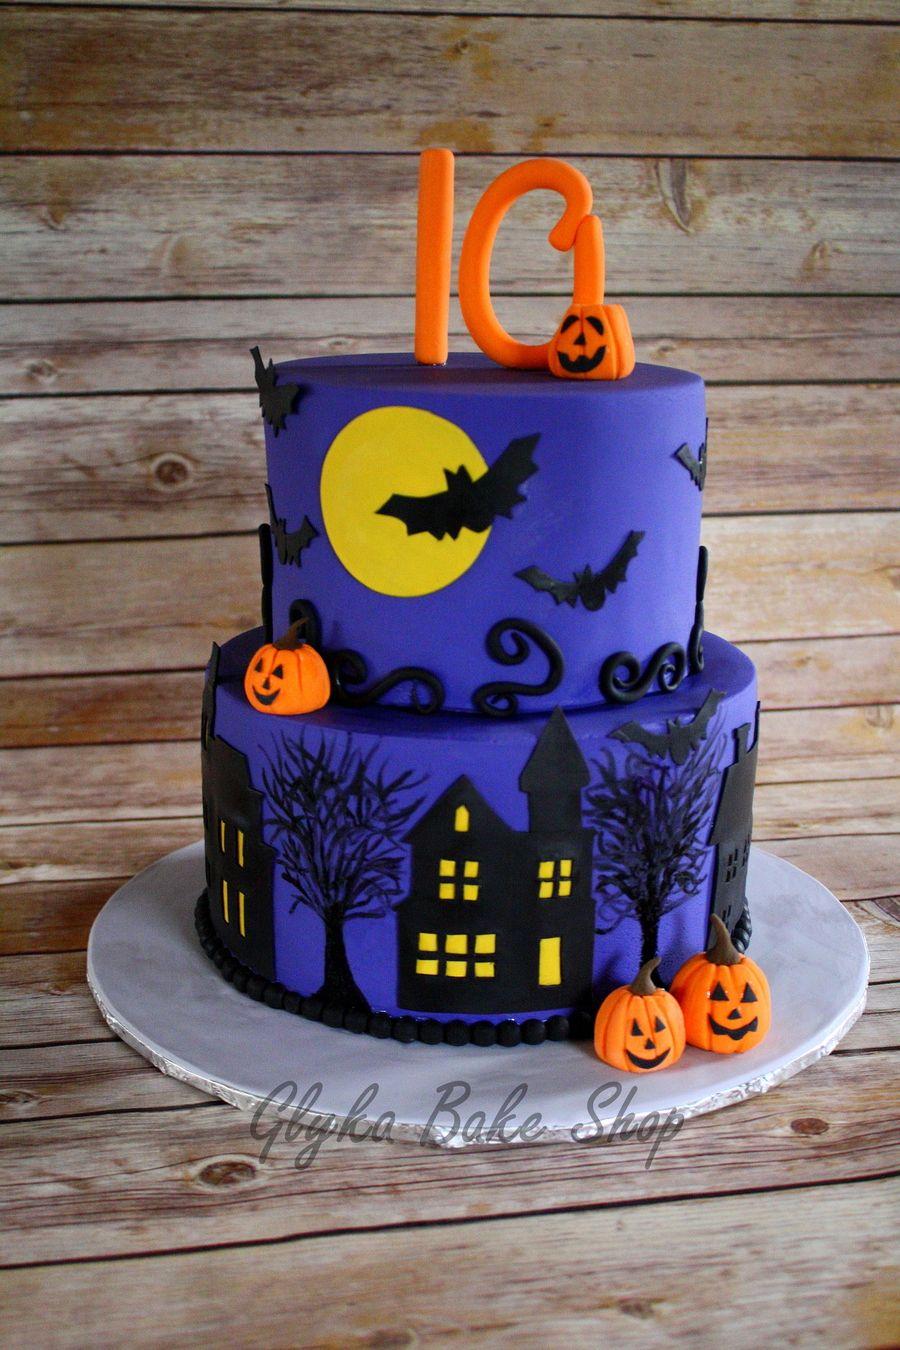 900_828736FymE_halloween-theme-birthday-cake-6-round-over-8-round ...